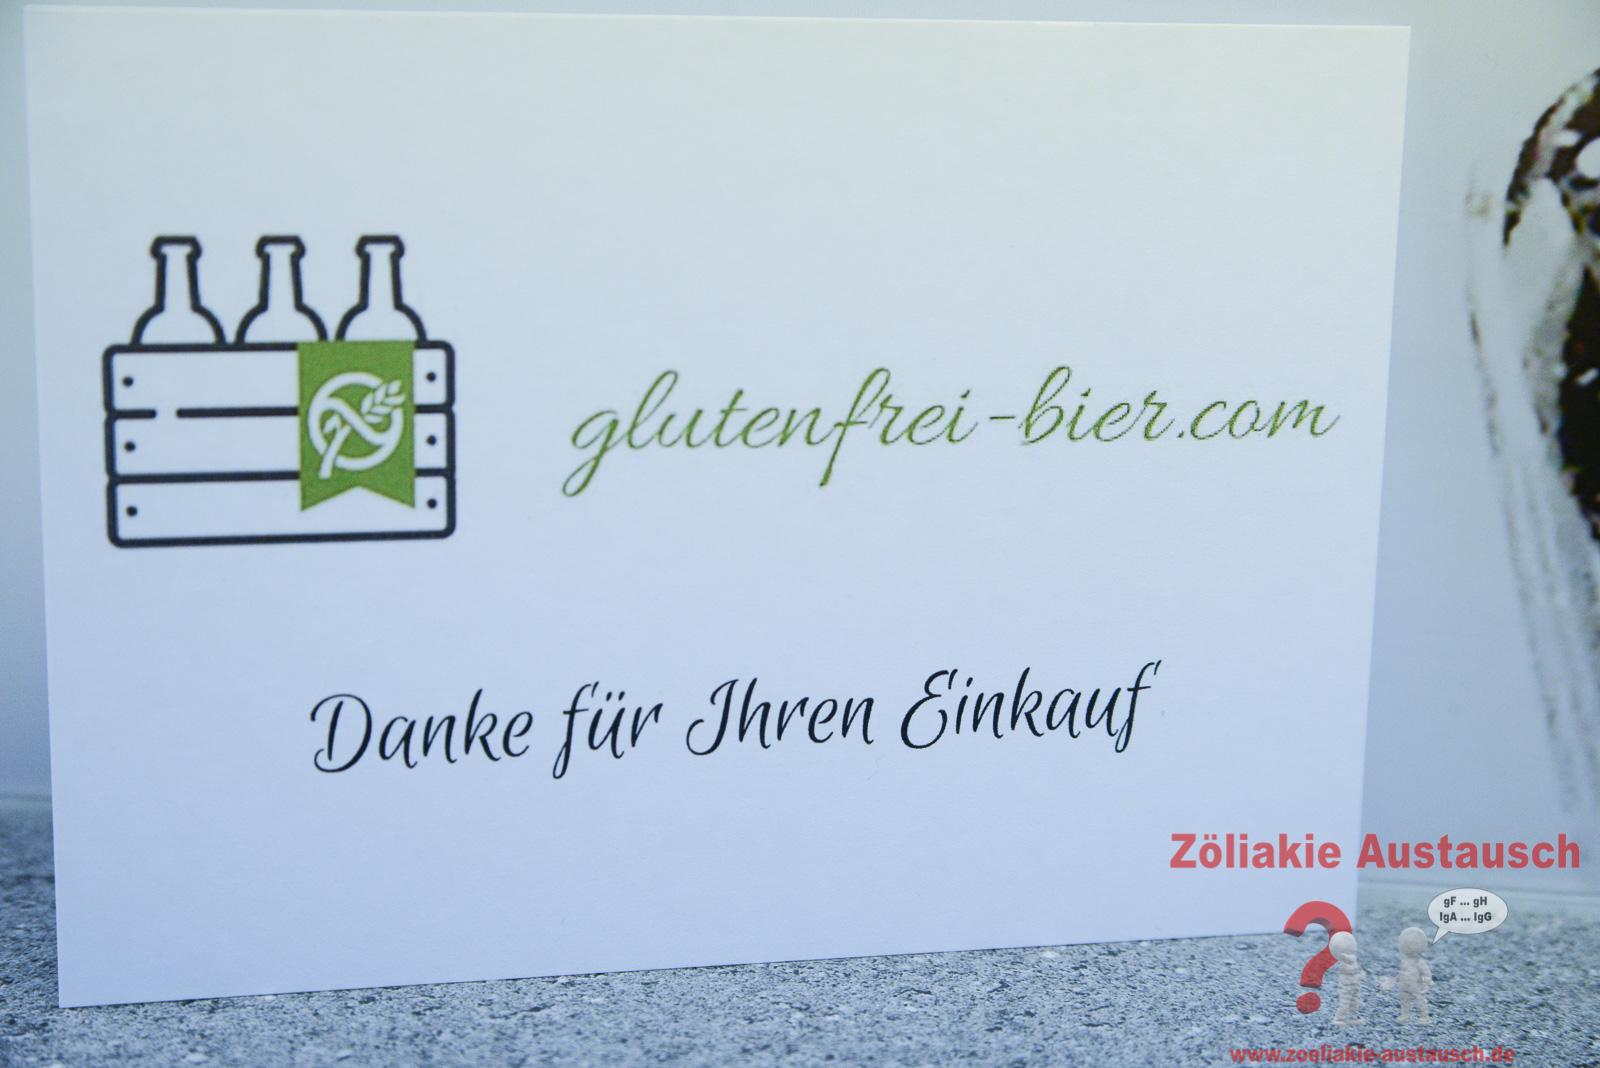 Greens_Glutenfrei_Bier_004